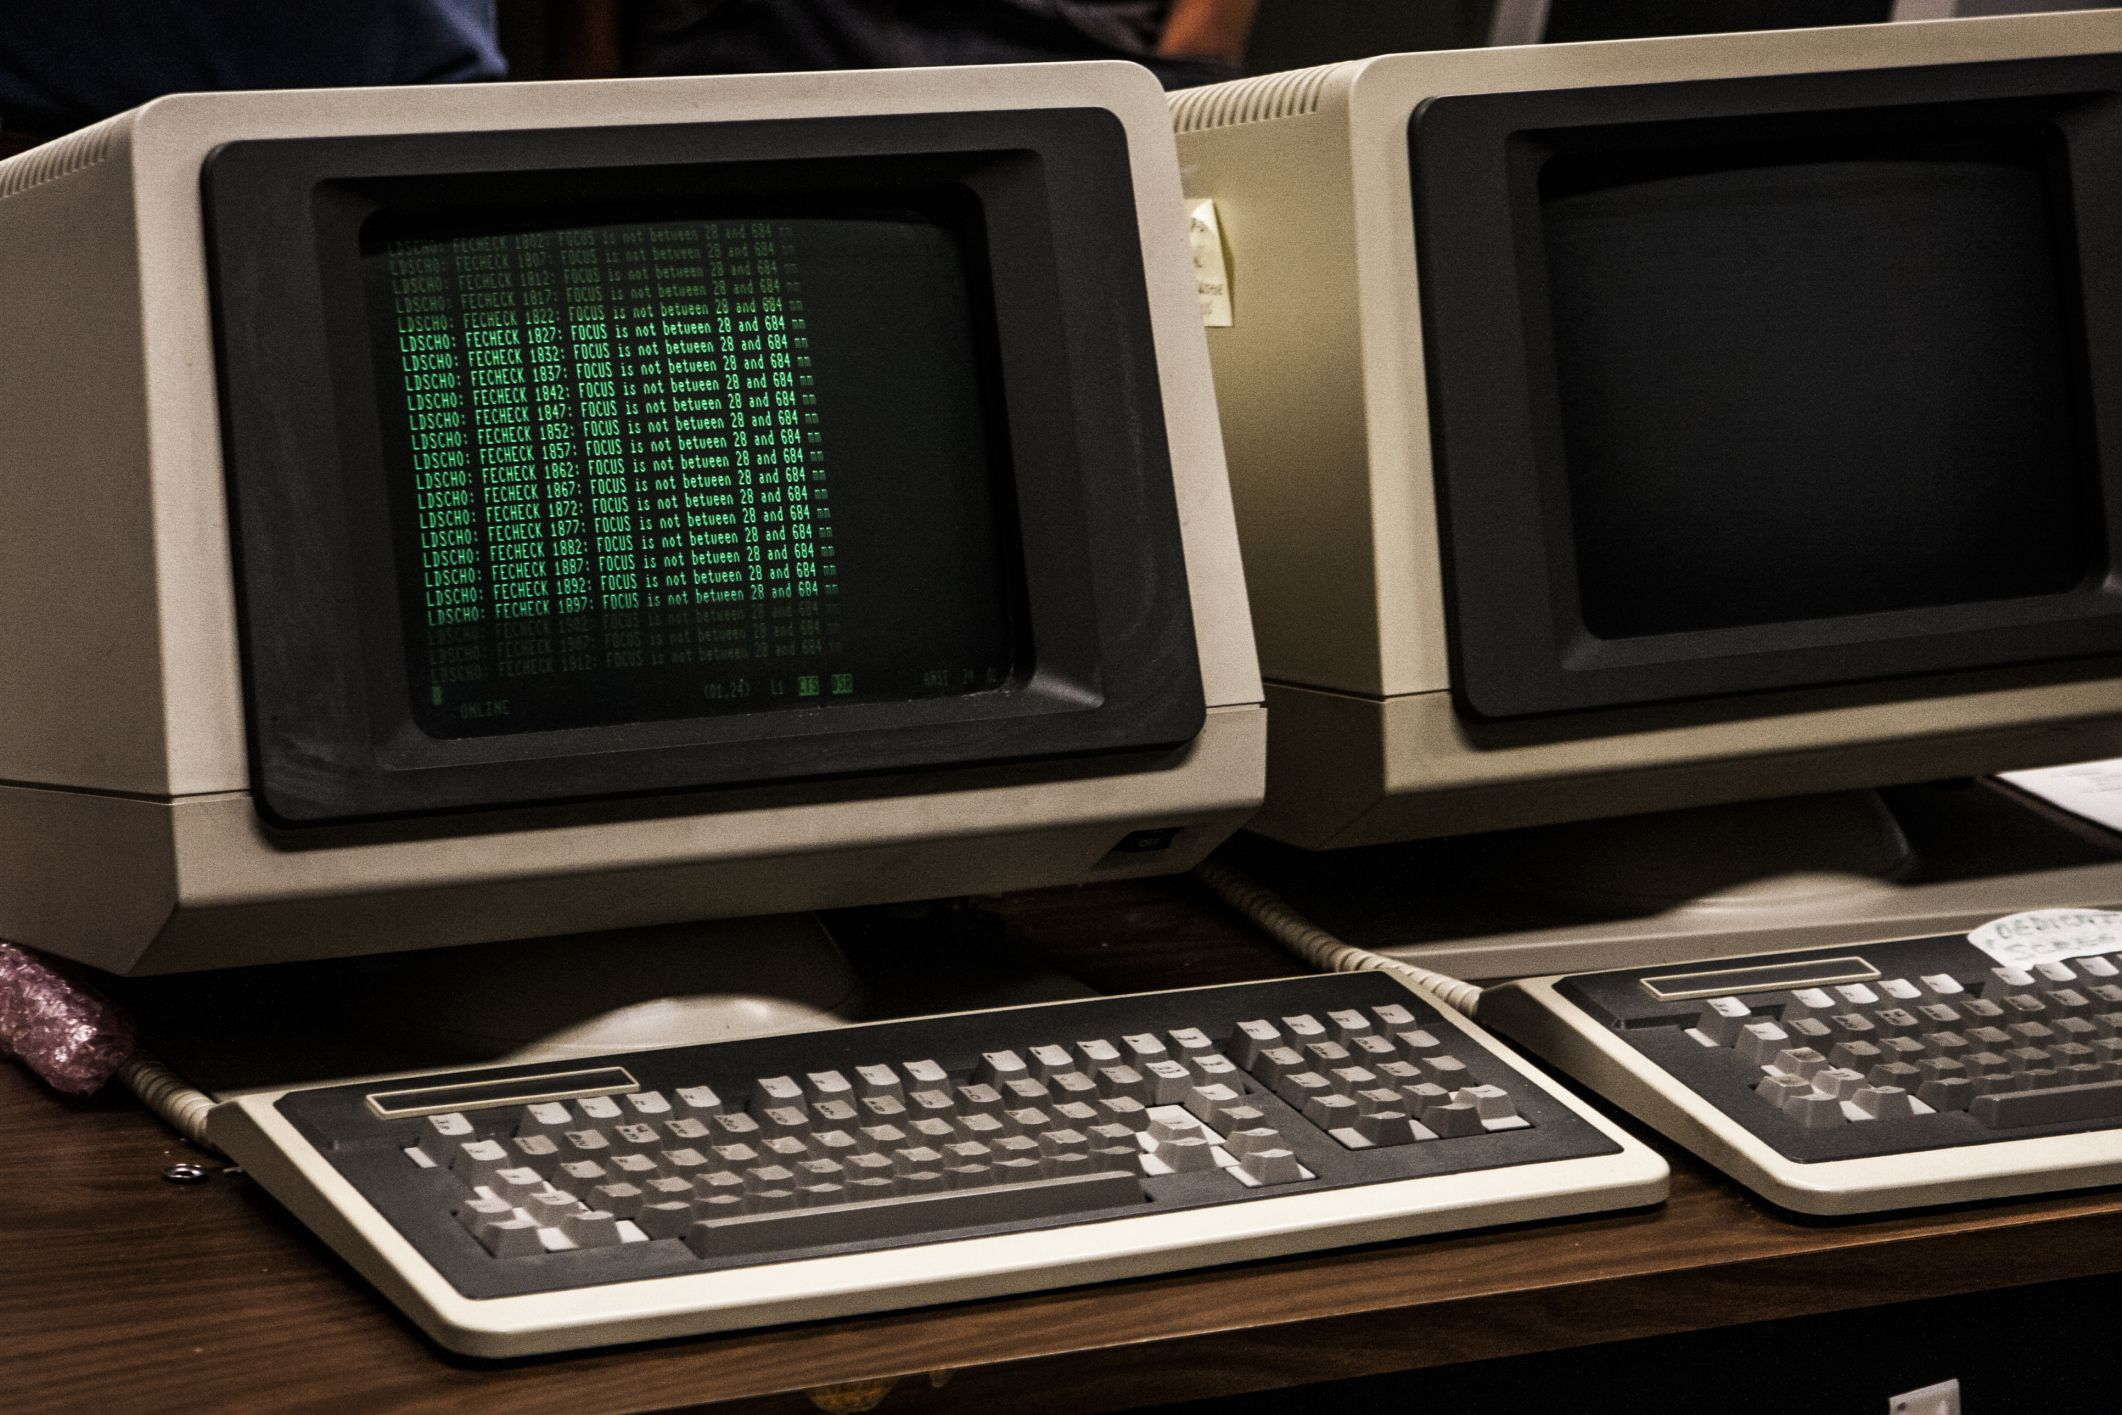 Microsoft BASIC Programming Language 1975